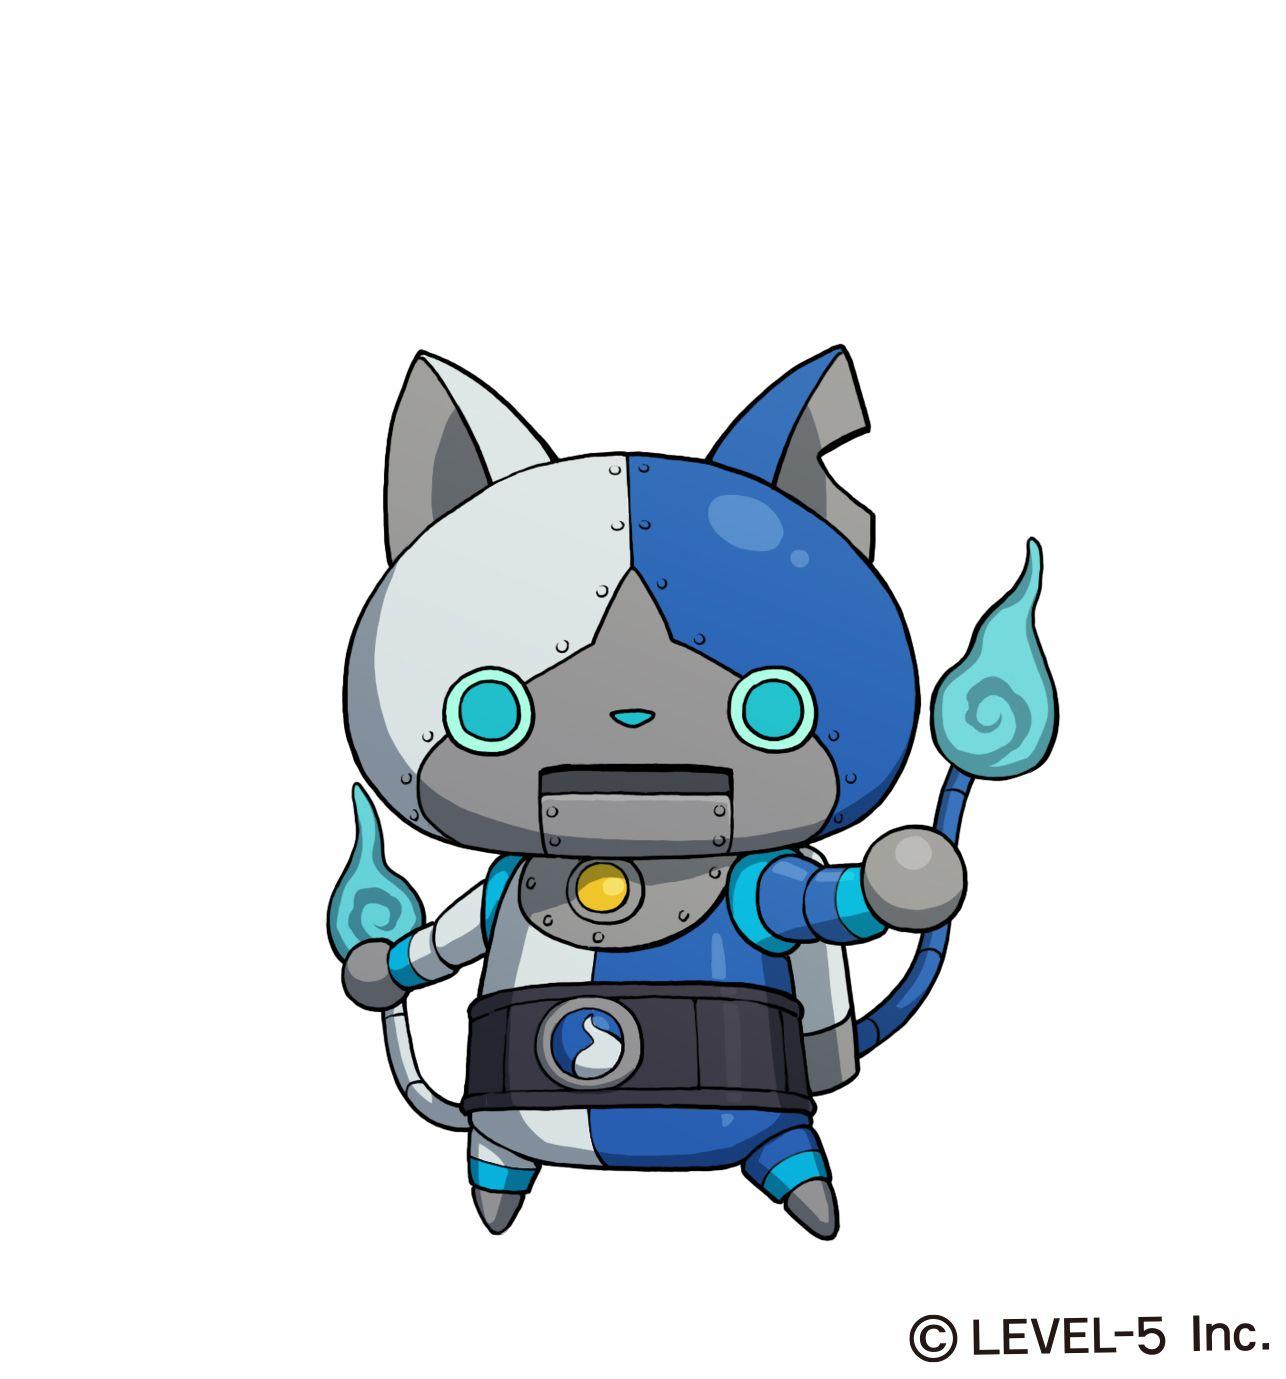 FFXIV_CharacterArtwork_Robonyan_F-Type_25052016_1464174406